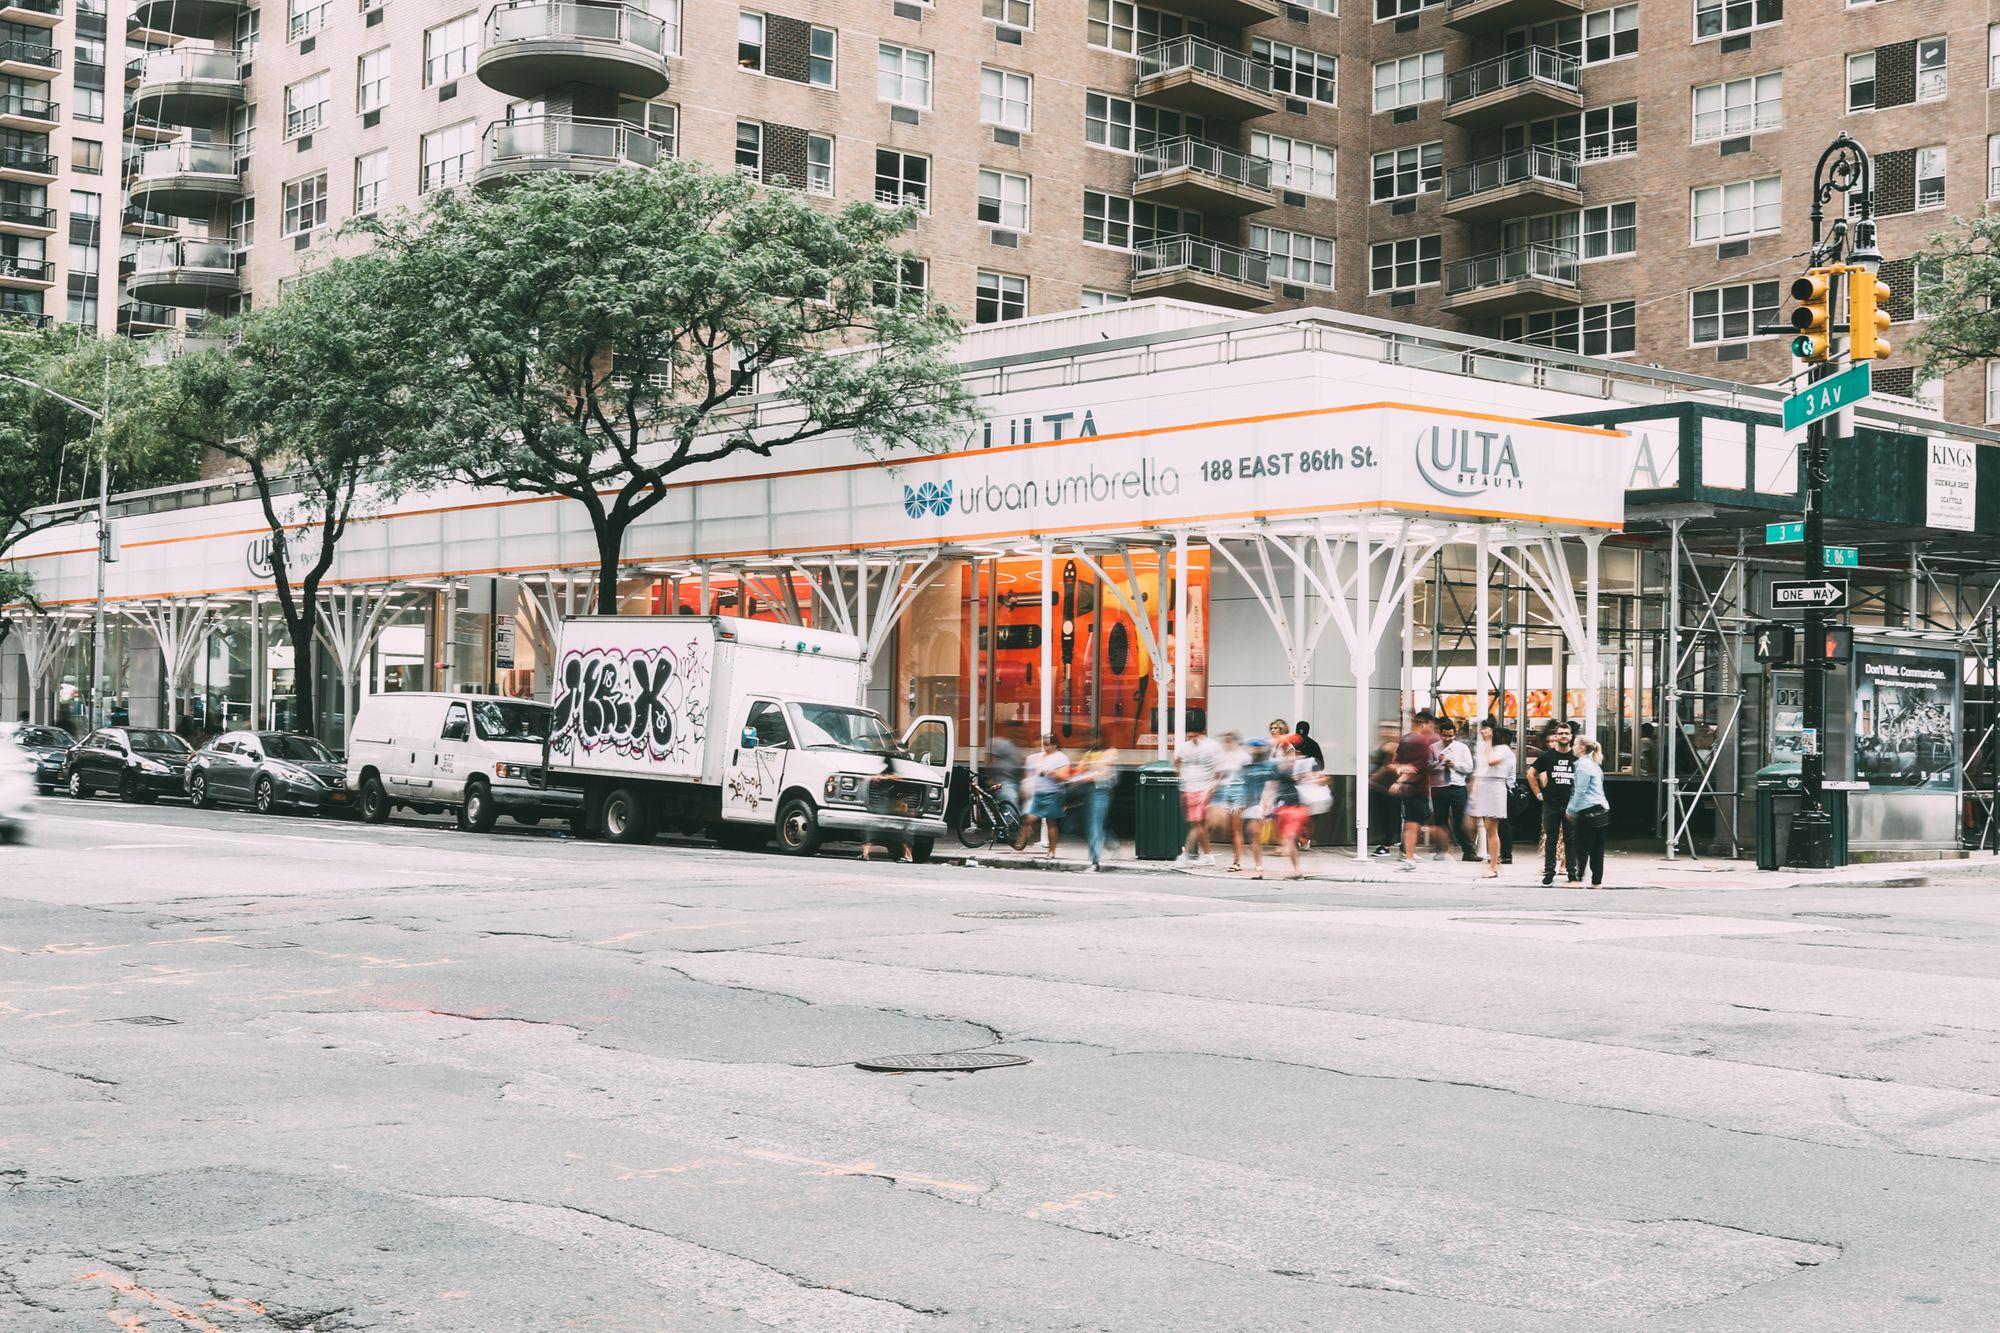 Urban Umbrella parapets create a space for custom brand signage.